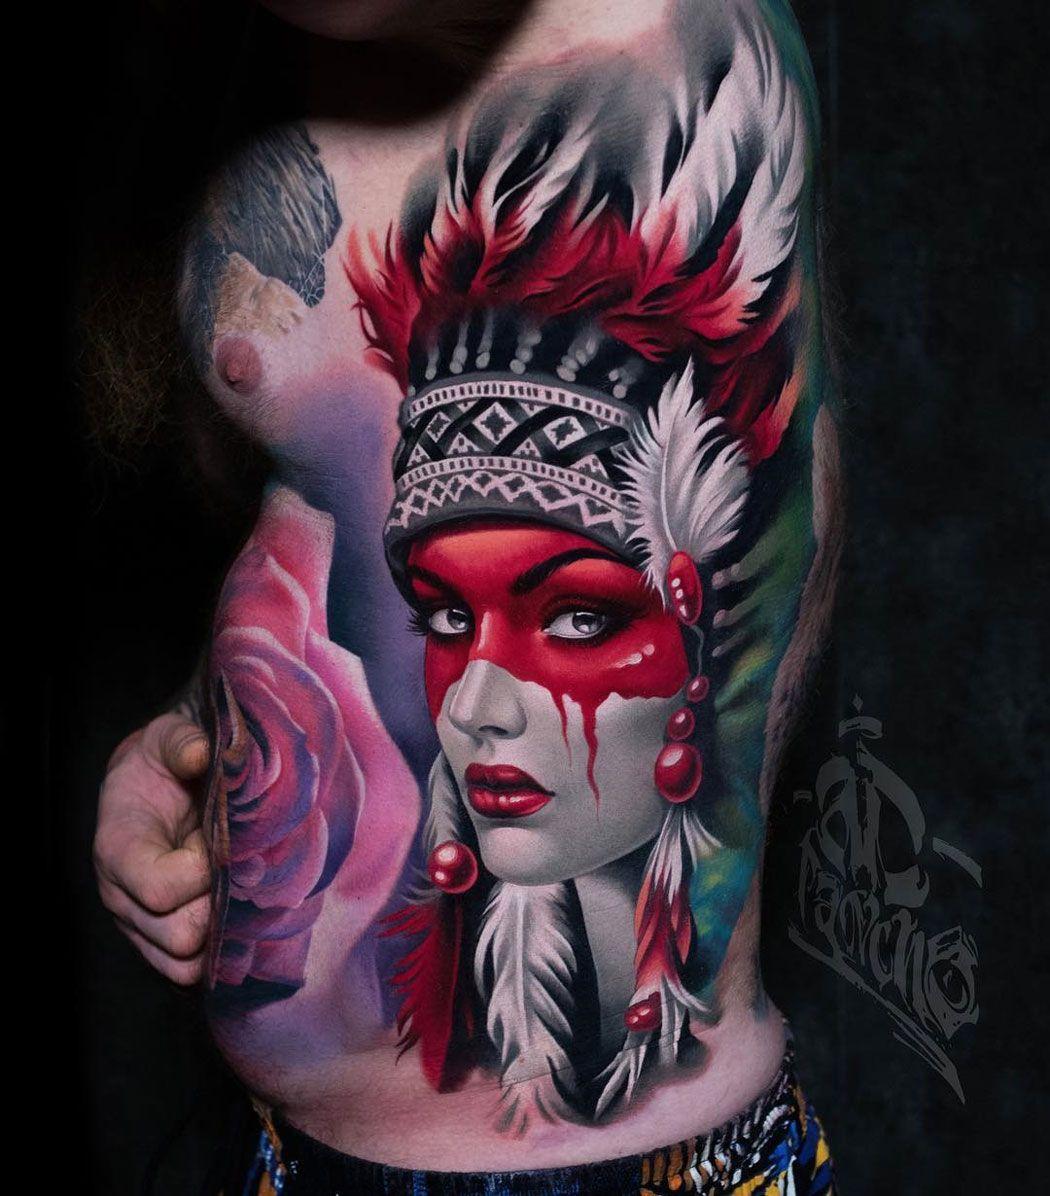 Native American Girl Native American Girl Tattoo Native American Girls Native American Tattoos